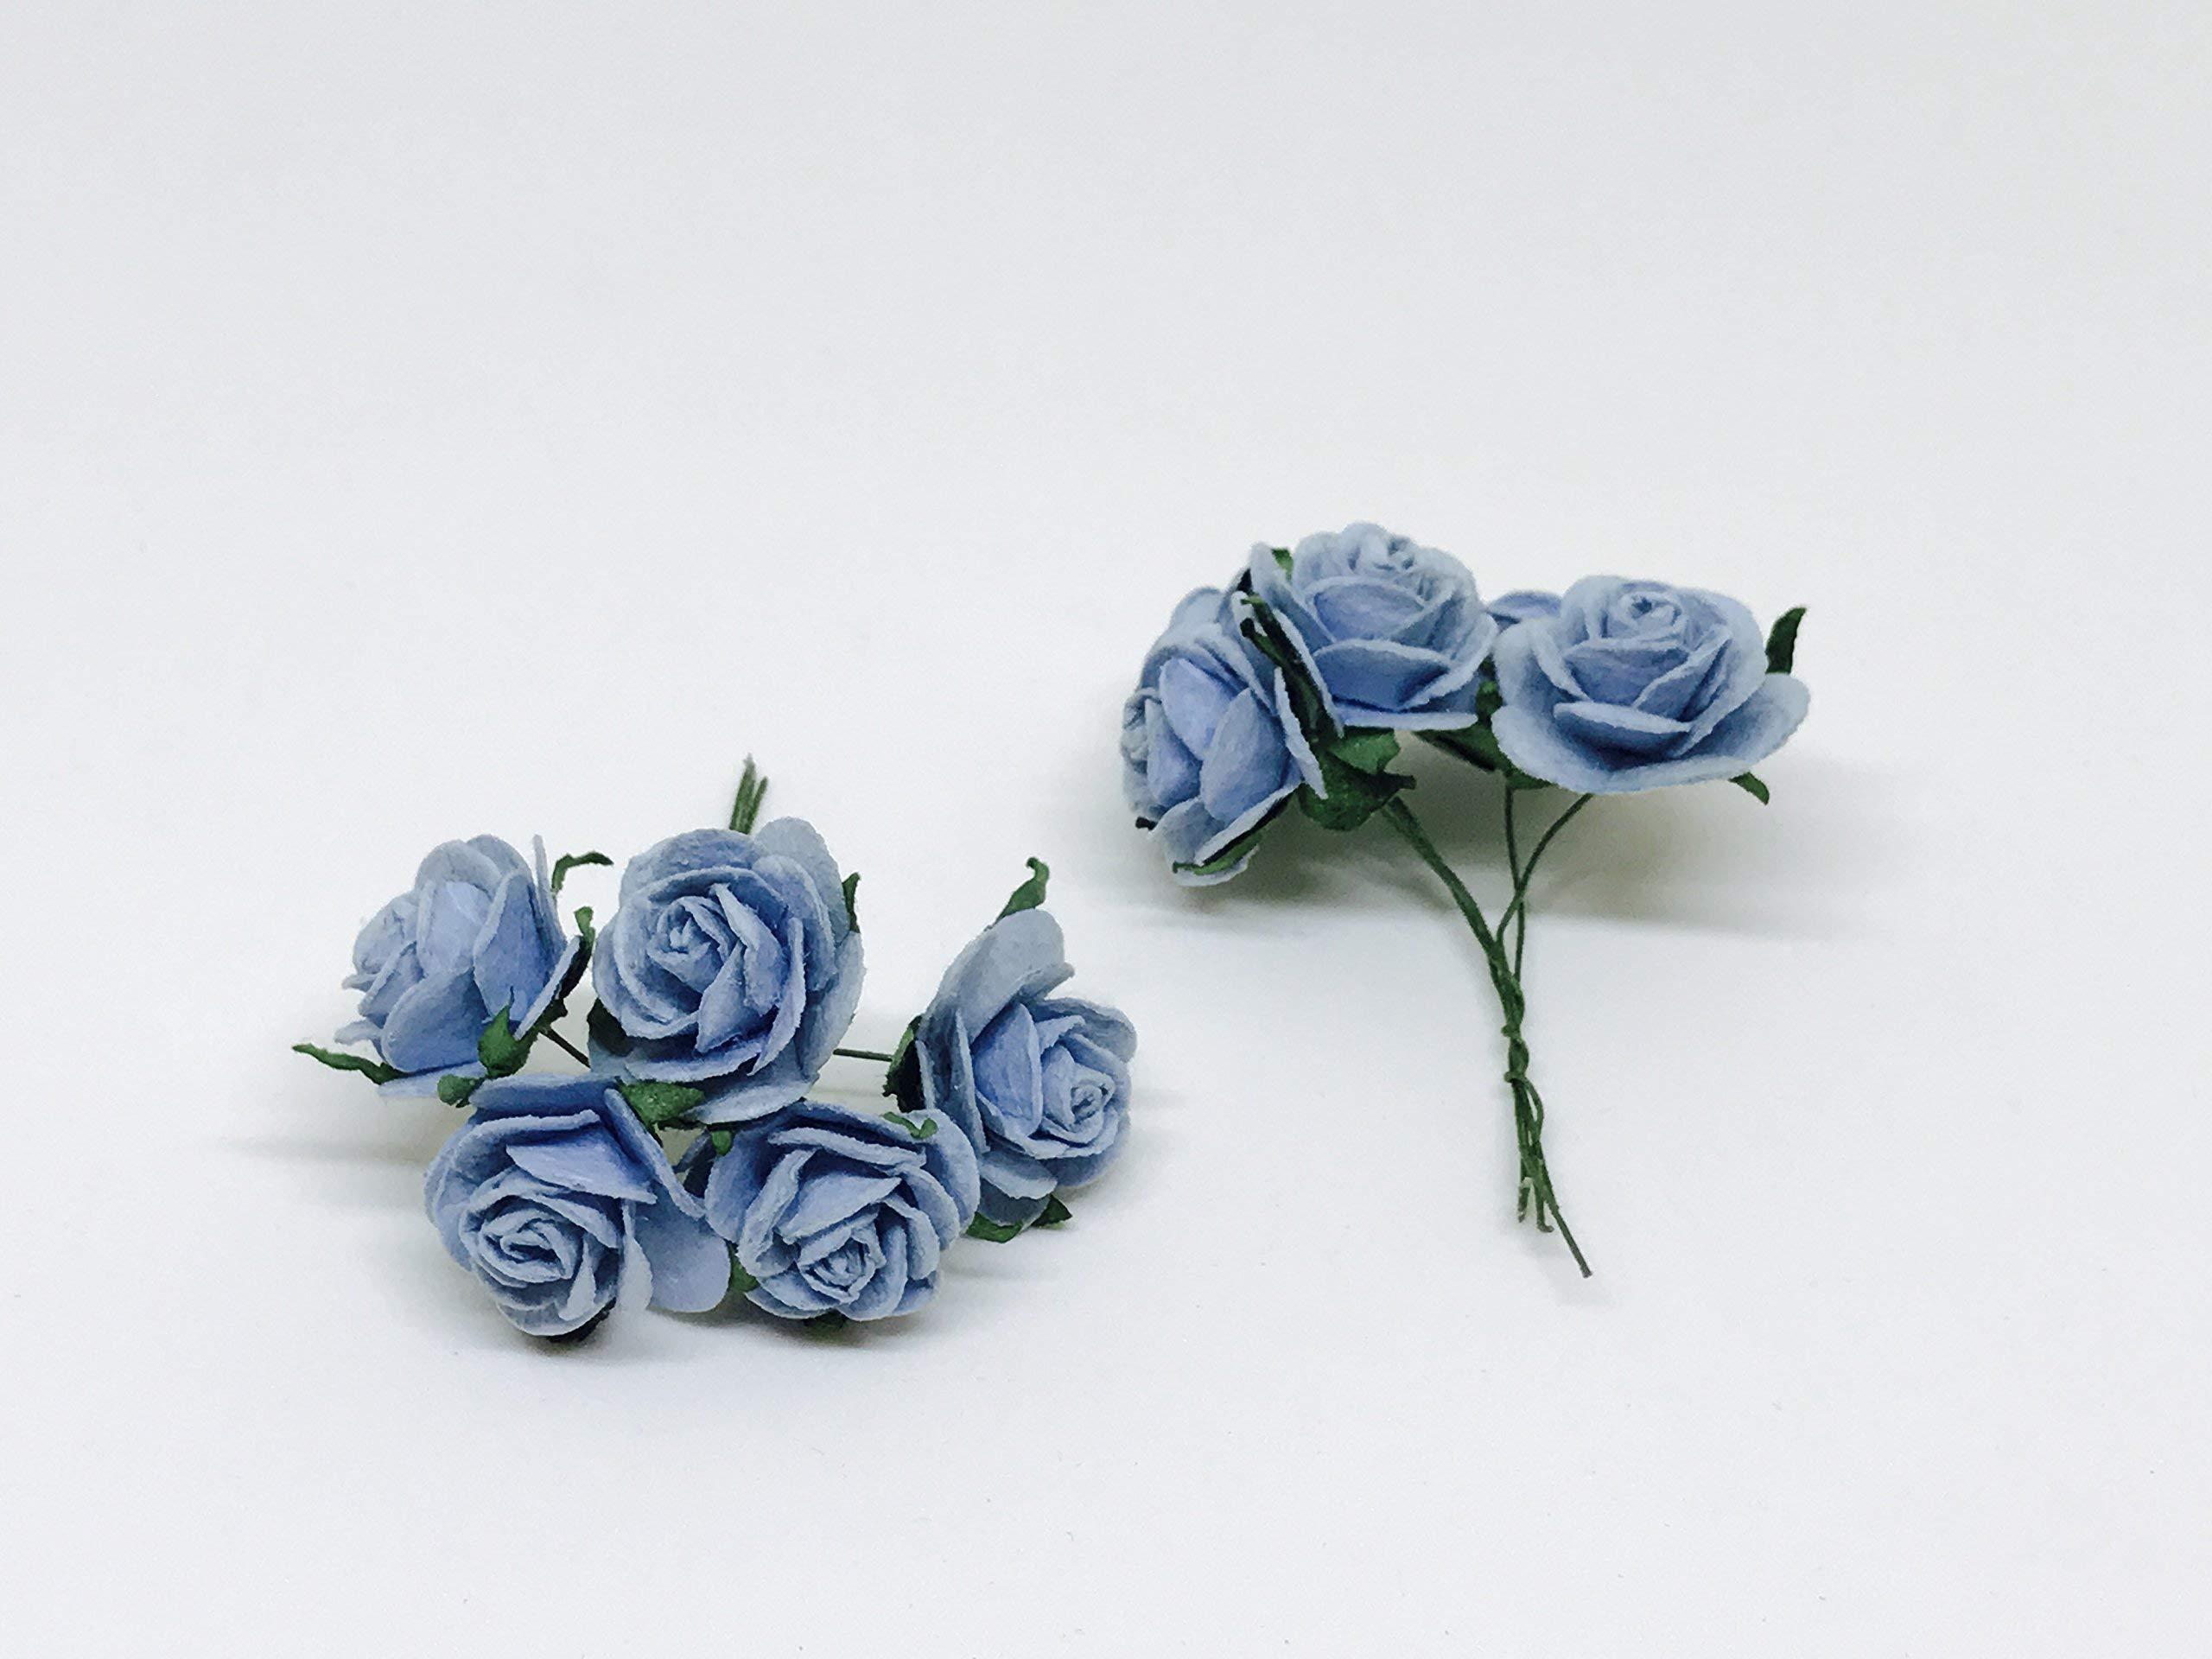 1-Blue-Paper-Flowers-Paper-Rose-Artificial-Flowers-Fake-Flowers-Artificial-Roses-Paper-Craft-Flowers-Paper-Rose-Flower-Mulberry-Paper-Flowers-20-Pieces